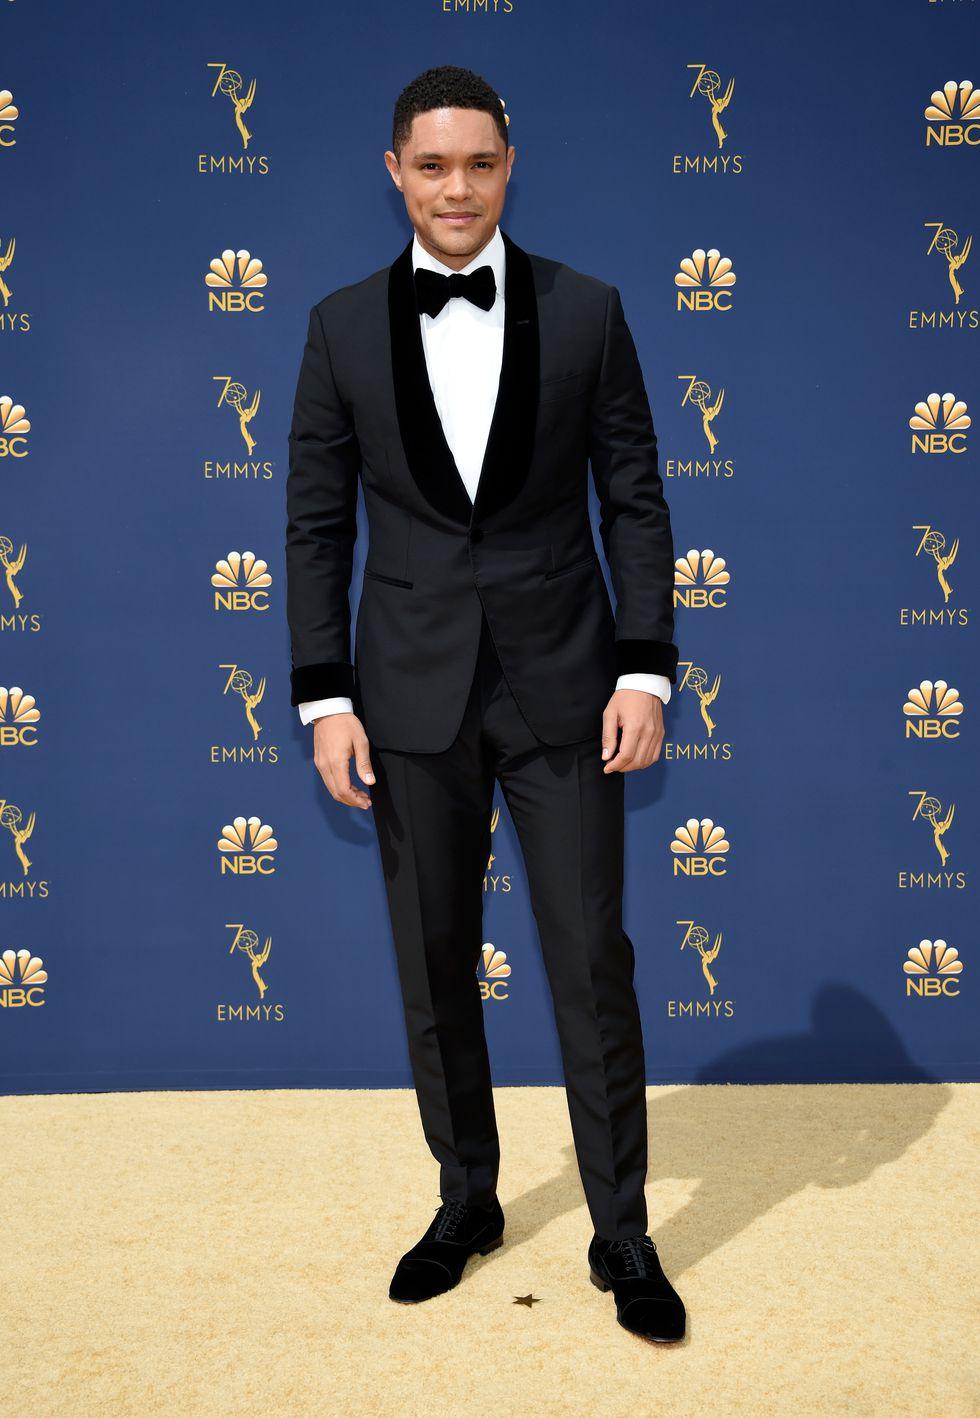 Trevor Noah in Christian Louboutin Shoes